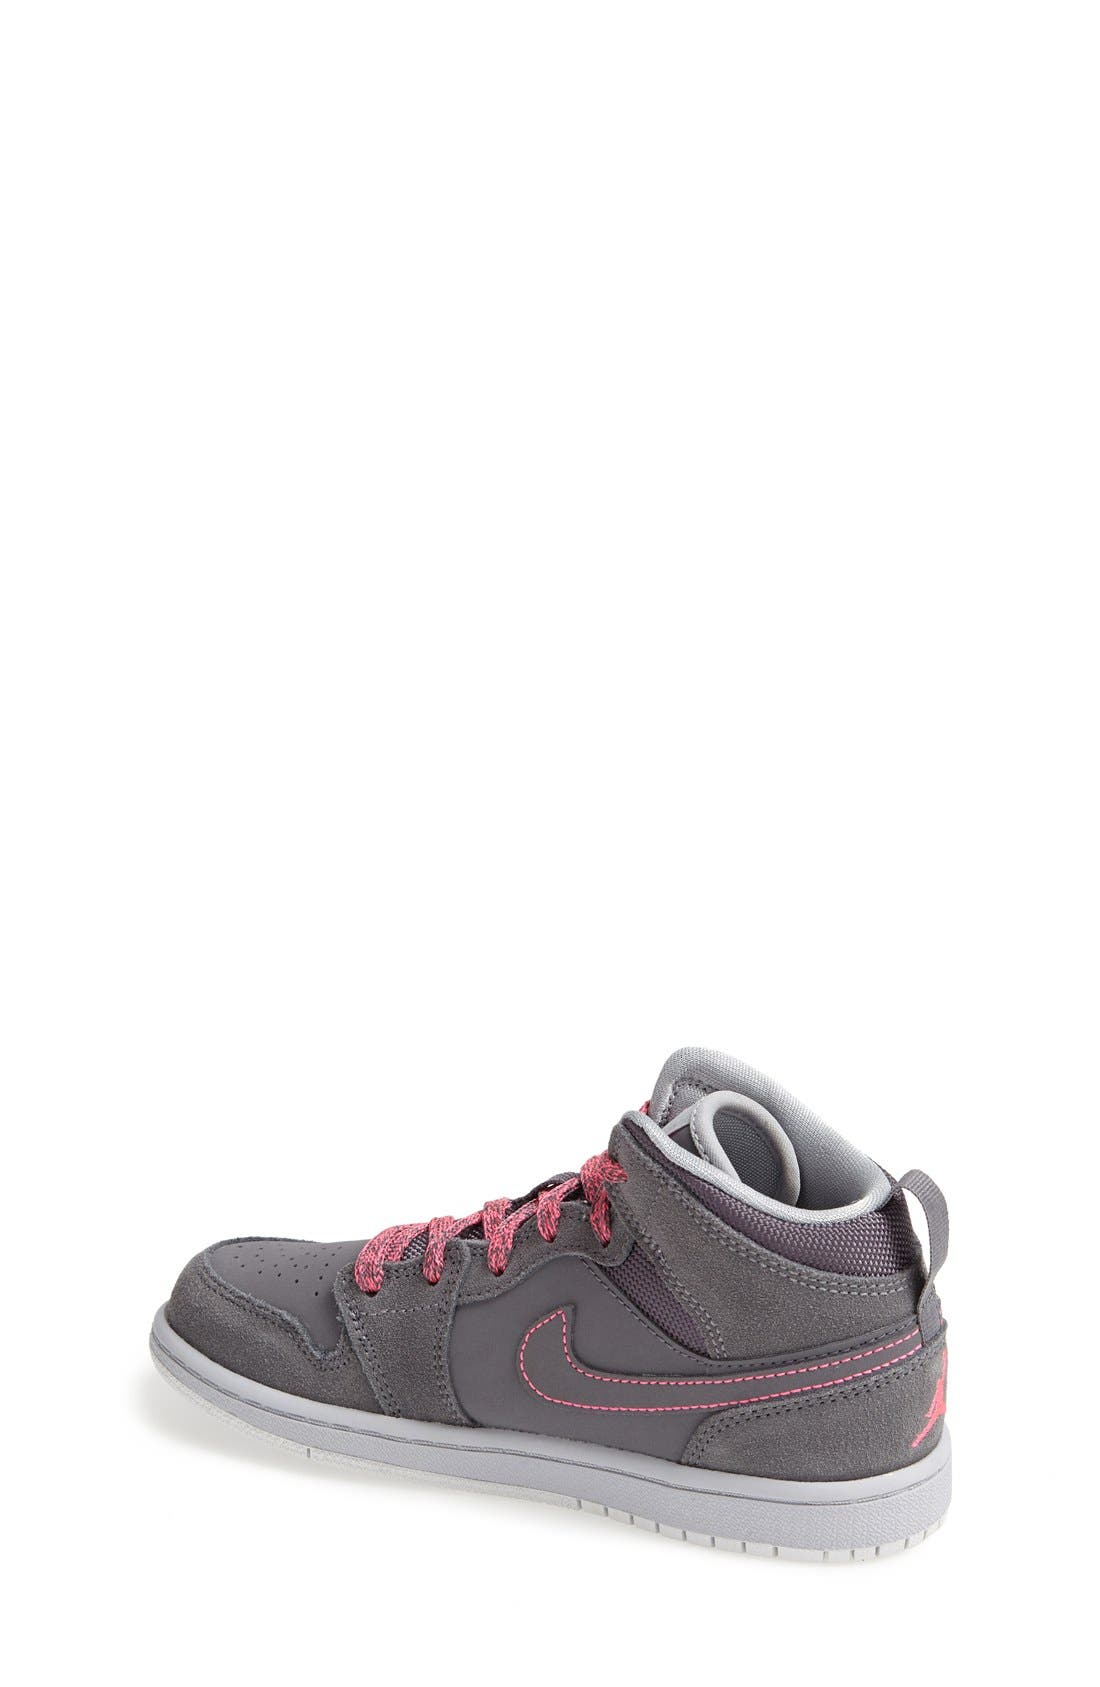 Alternate Image 2  - Nike 'Air Jordan 1 Mid' Sneaker (Toddler & Little Kid)